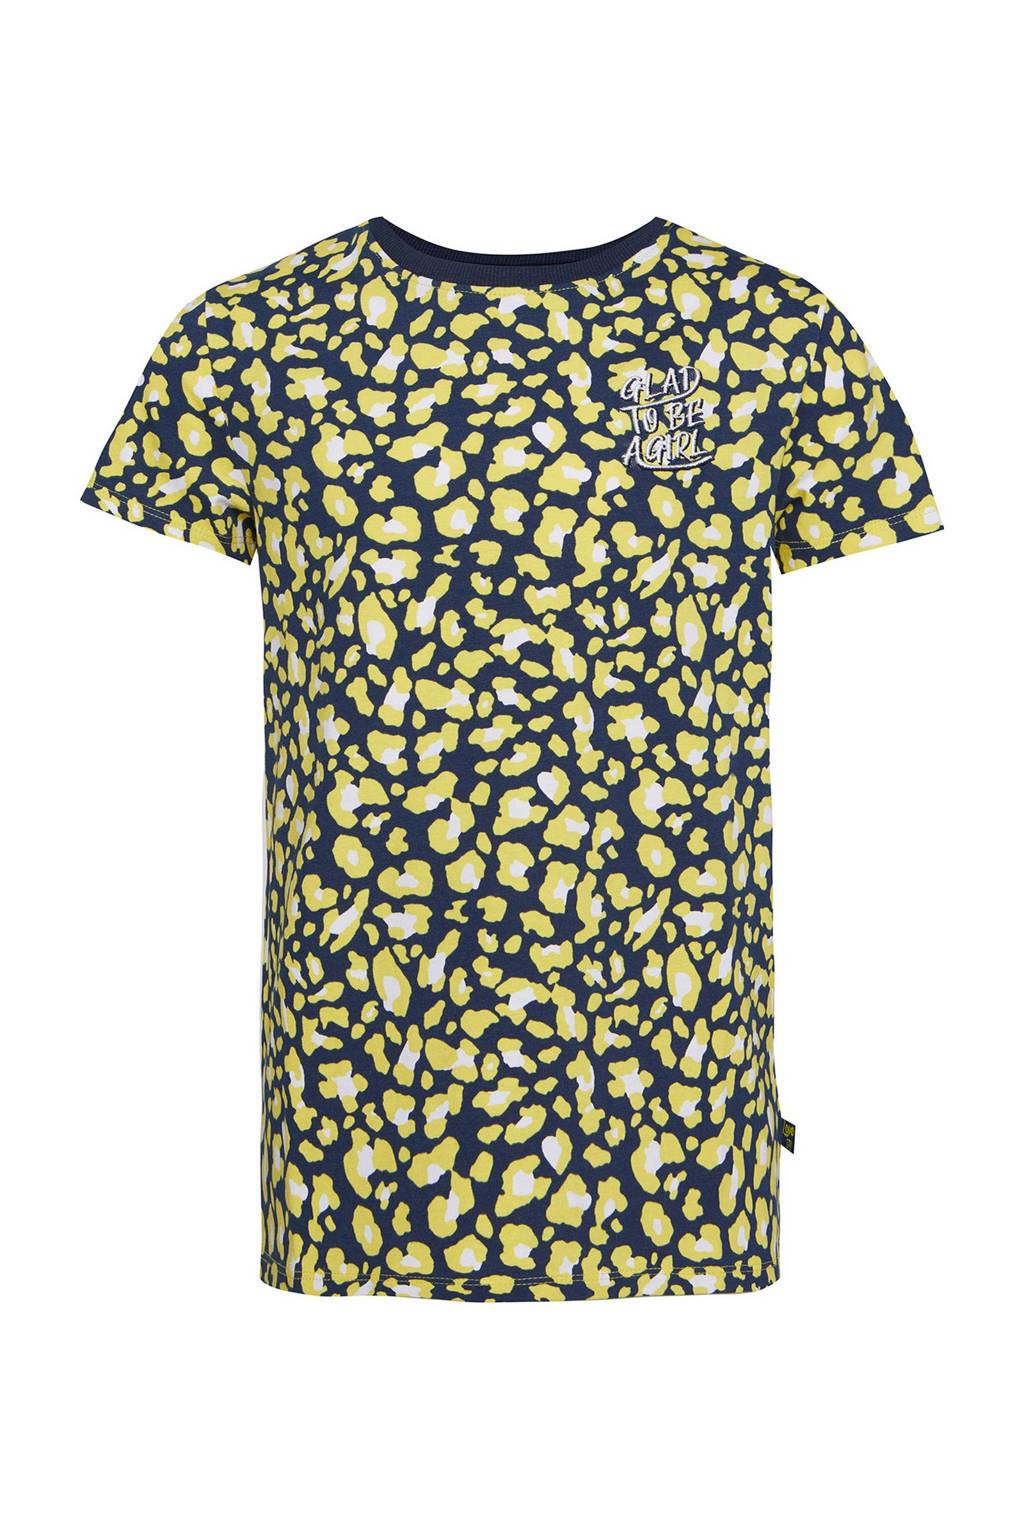 WE Fashion T-shirt met all over print geel/zwart/wit, Geel/zwart/wit